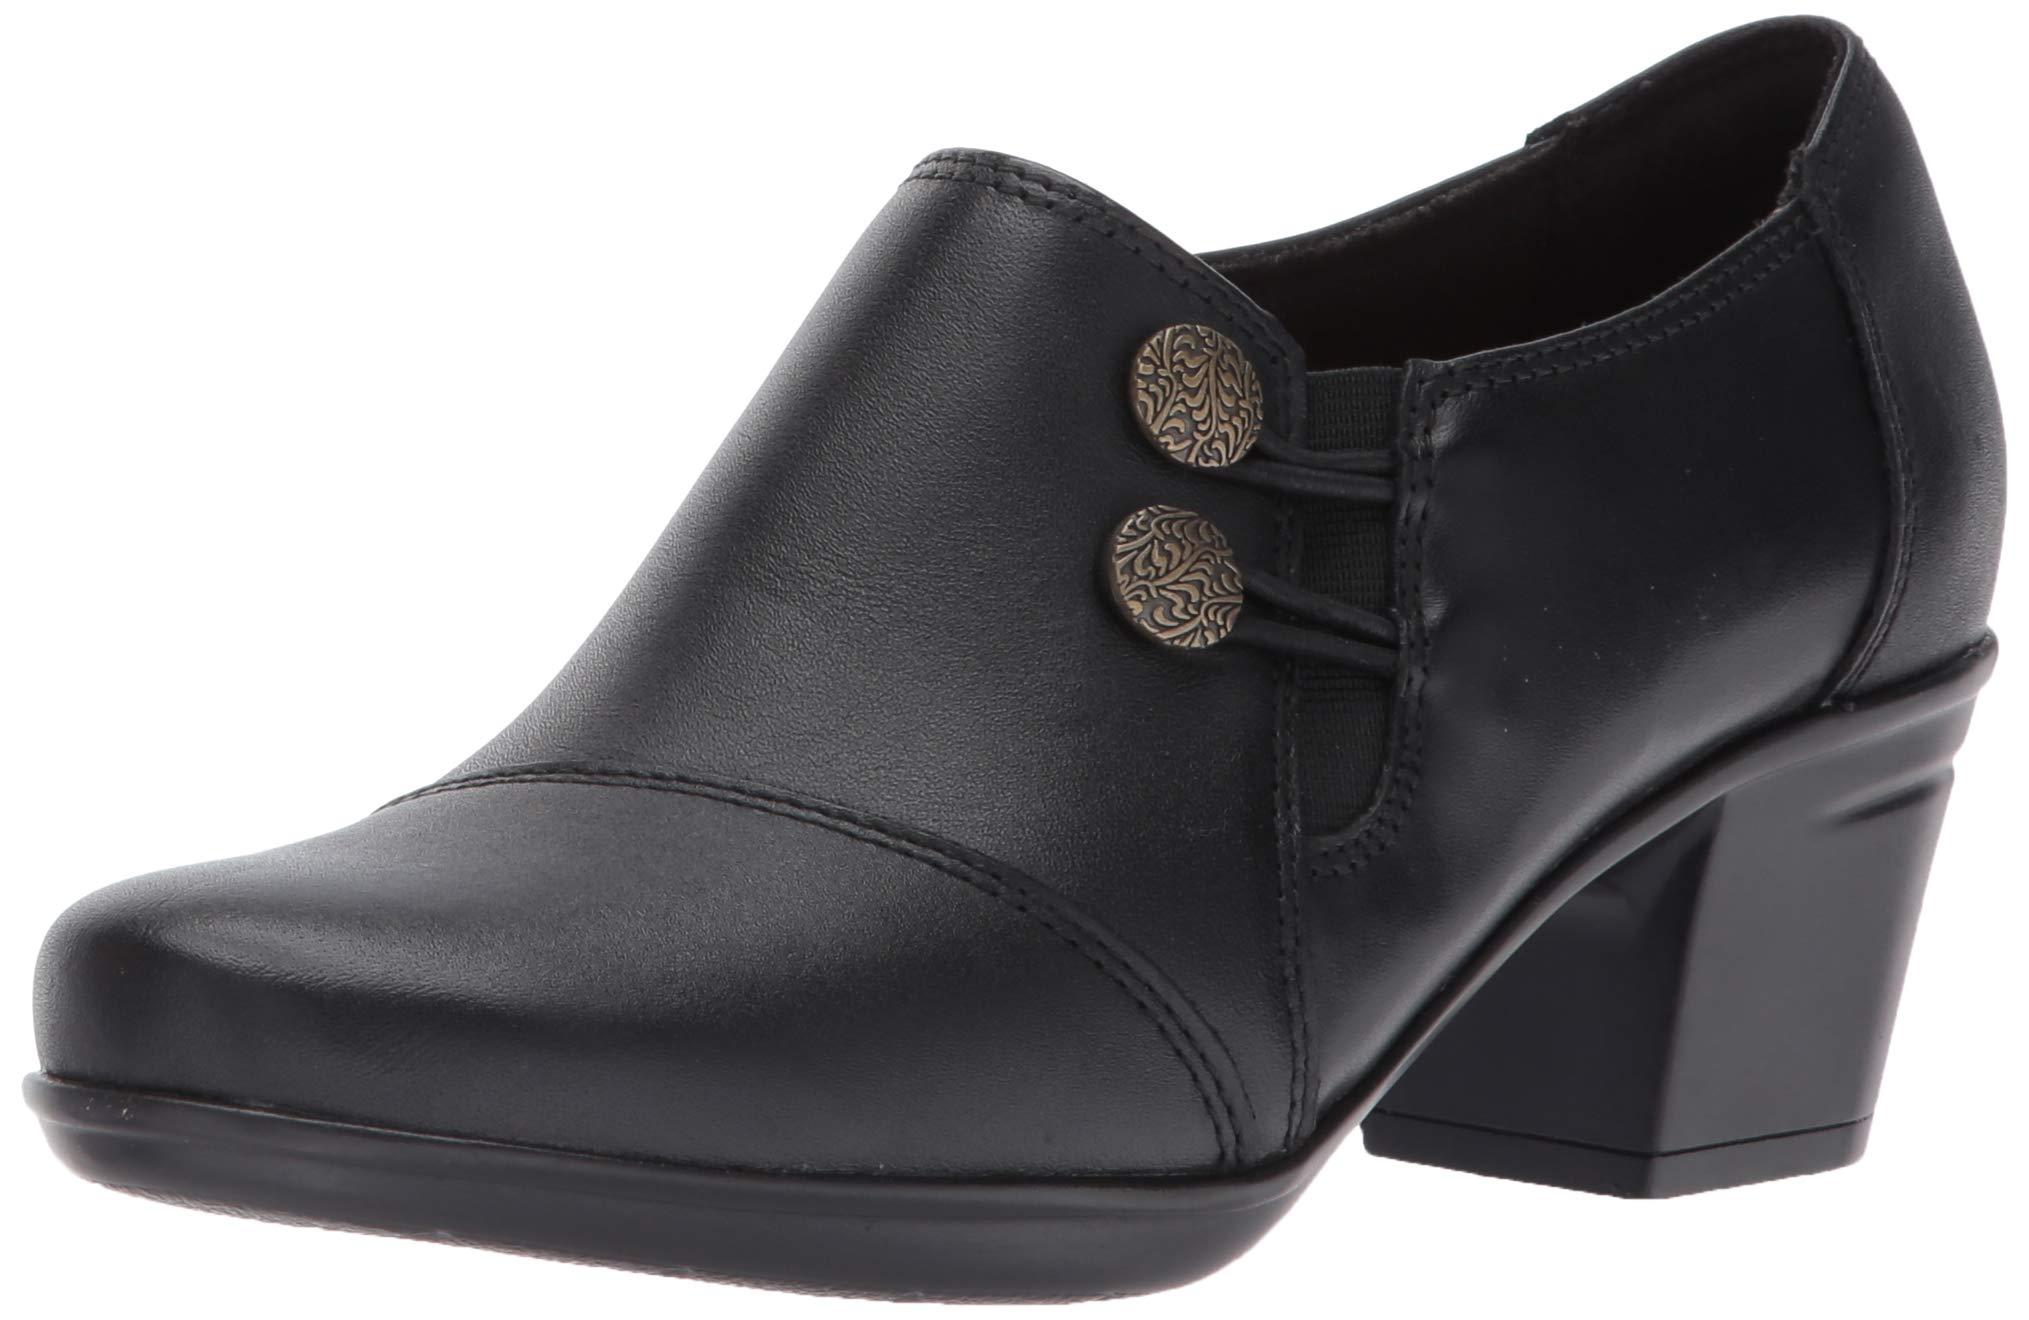 Clarks Women's Emslie Warren Slip-on Loafer,Black Leather,8 M US by CLARKS